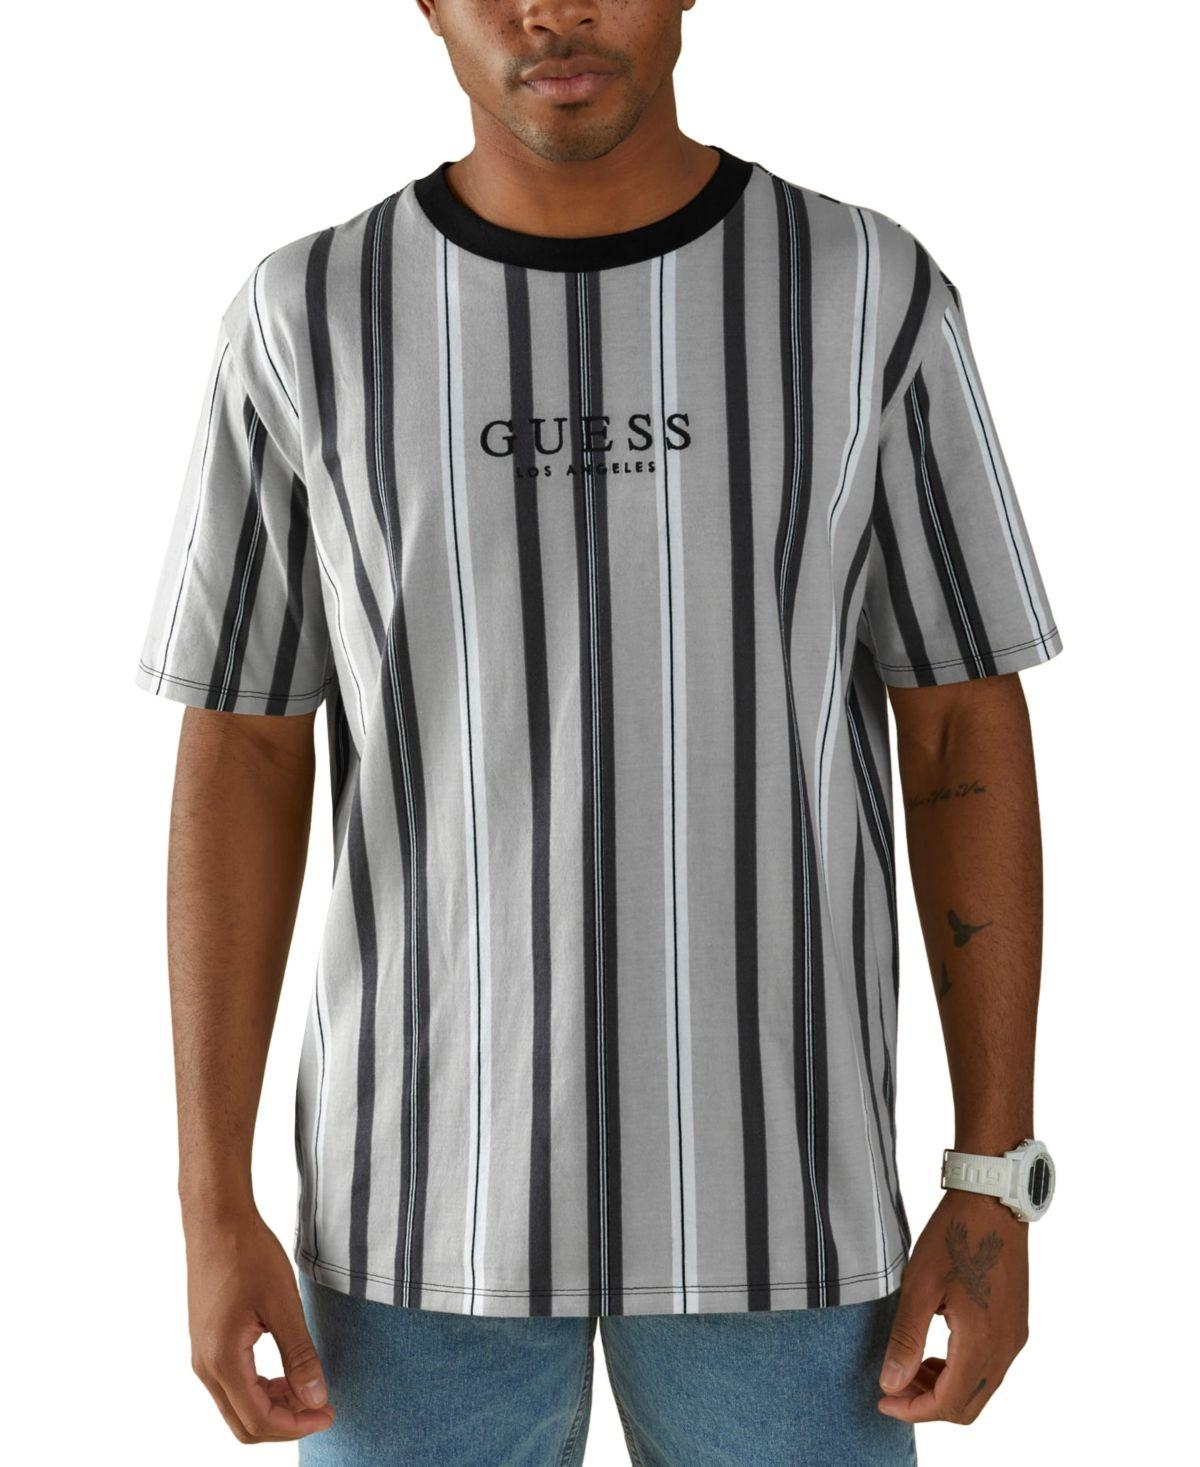 50++ Mens striped t shirt ideas info